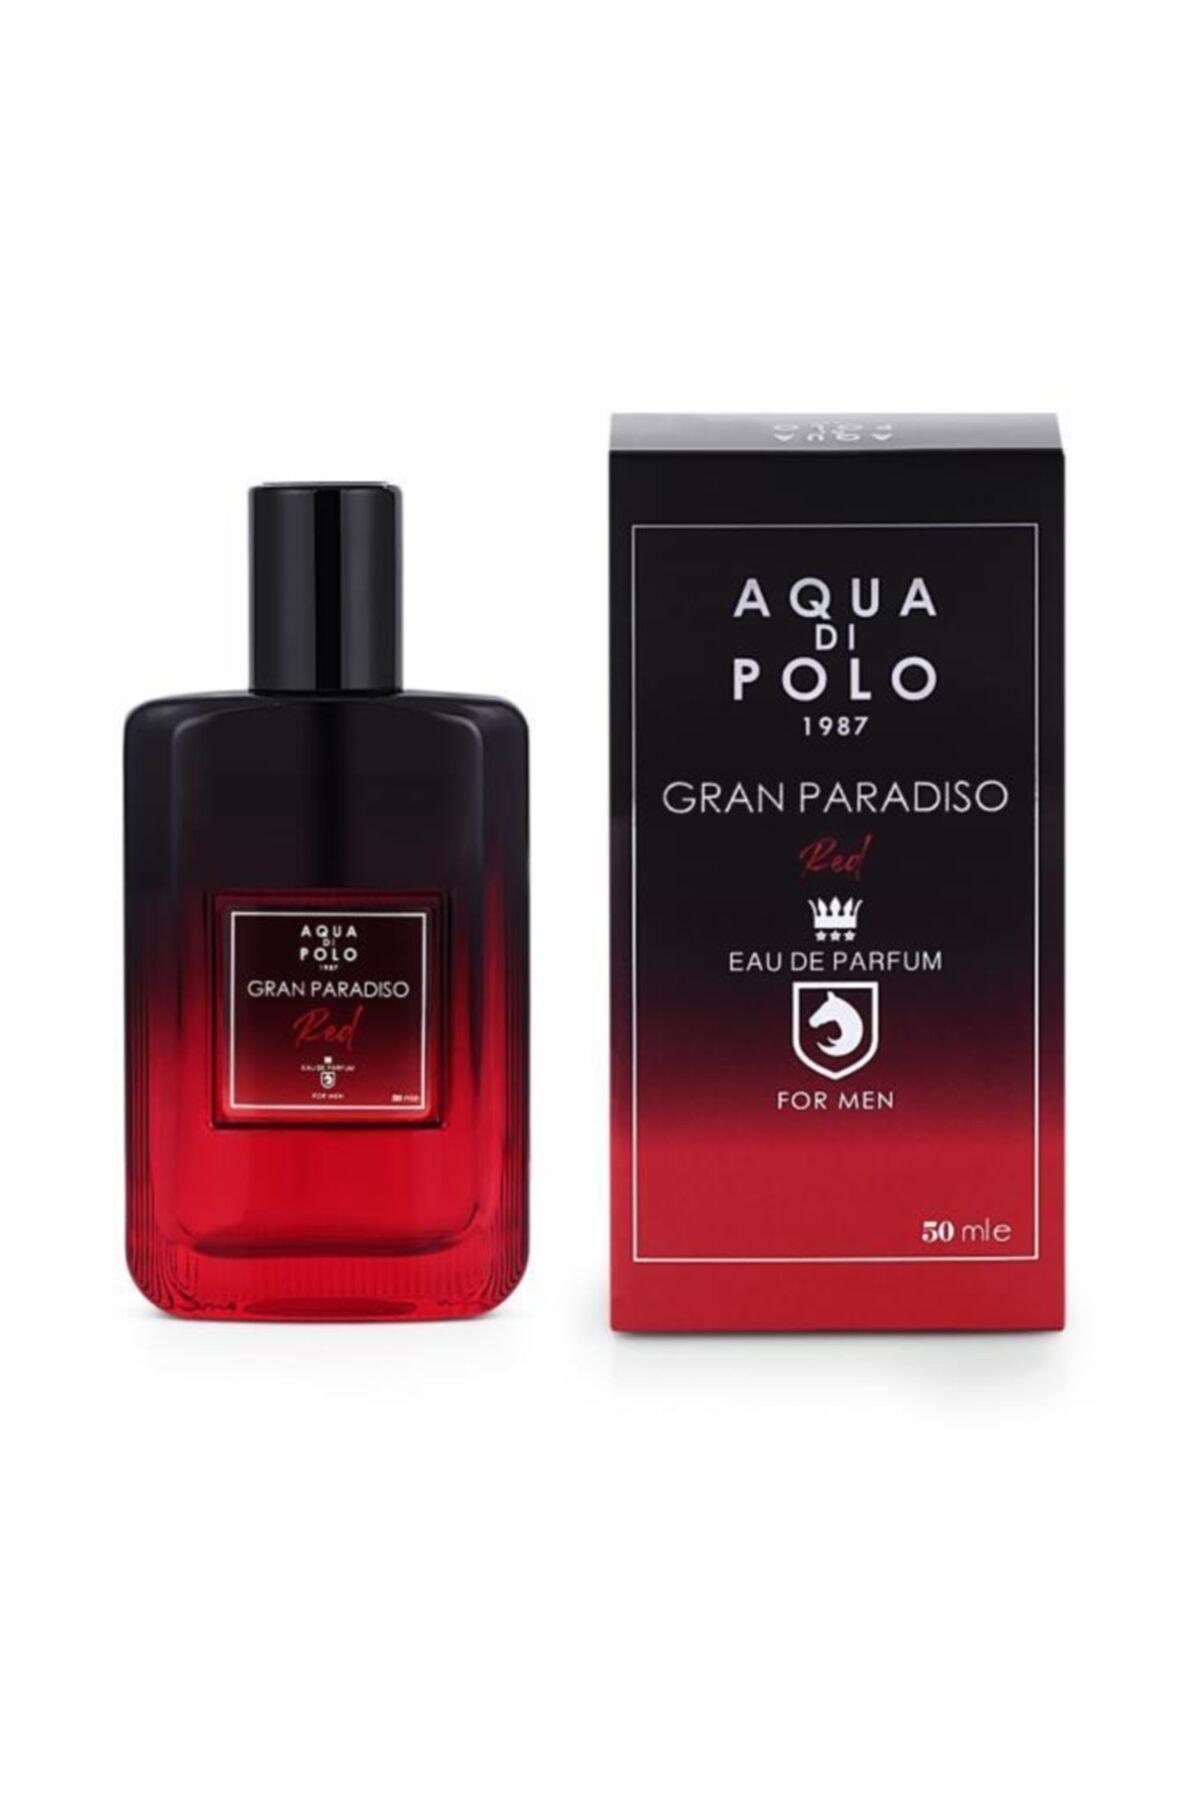 ادکلن بلند مارک Aqua Di Polo 1987 رنگ مشکی کد ty33002637